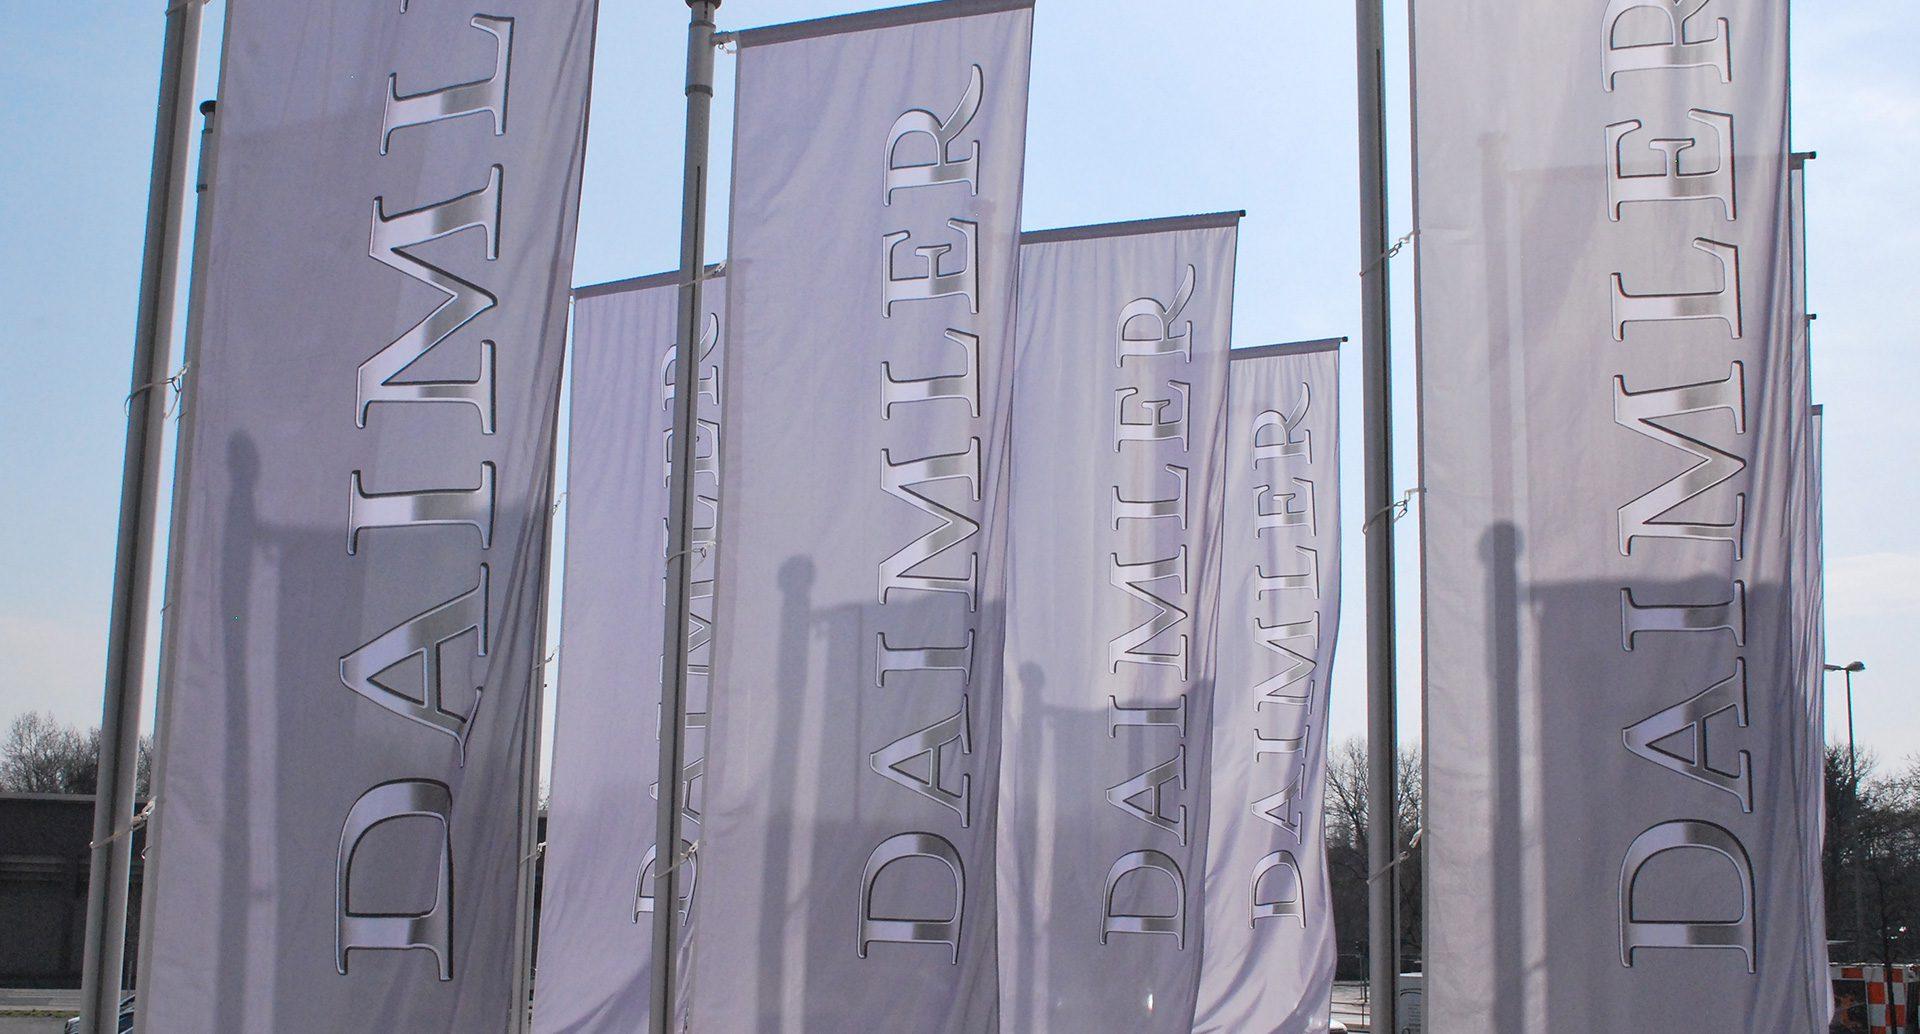 Daimler Corporate Design Logo auf Fahnen